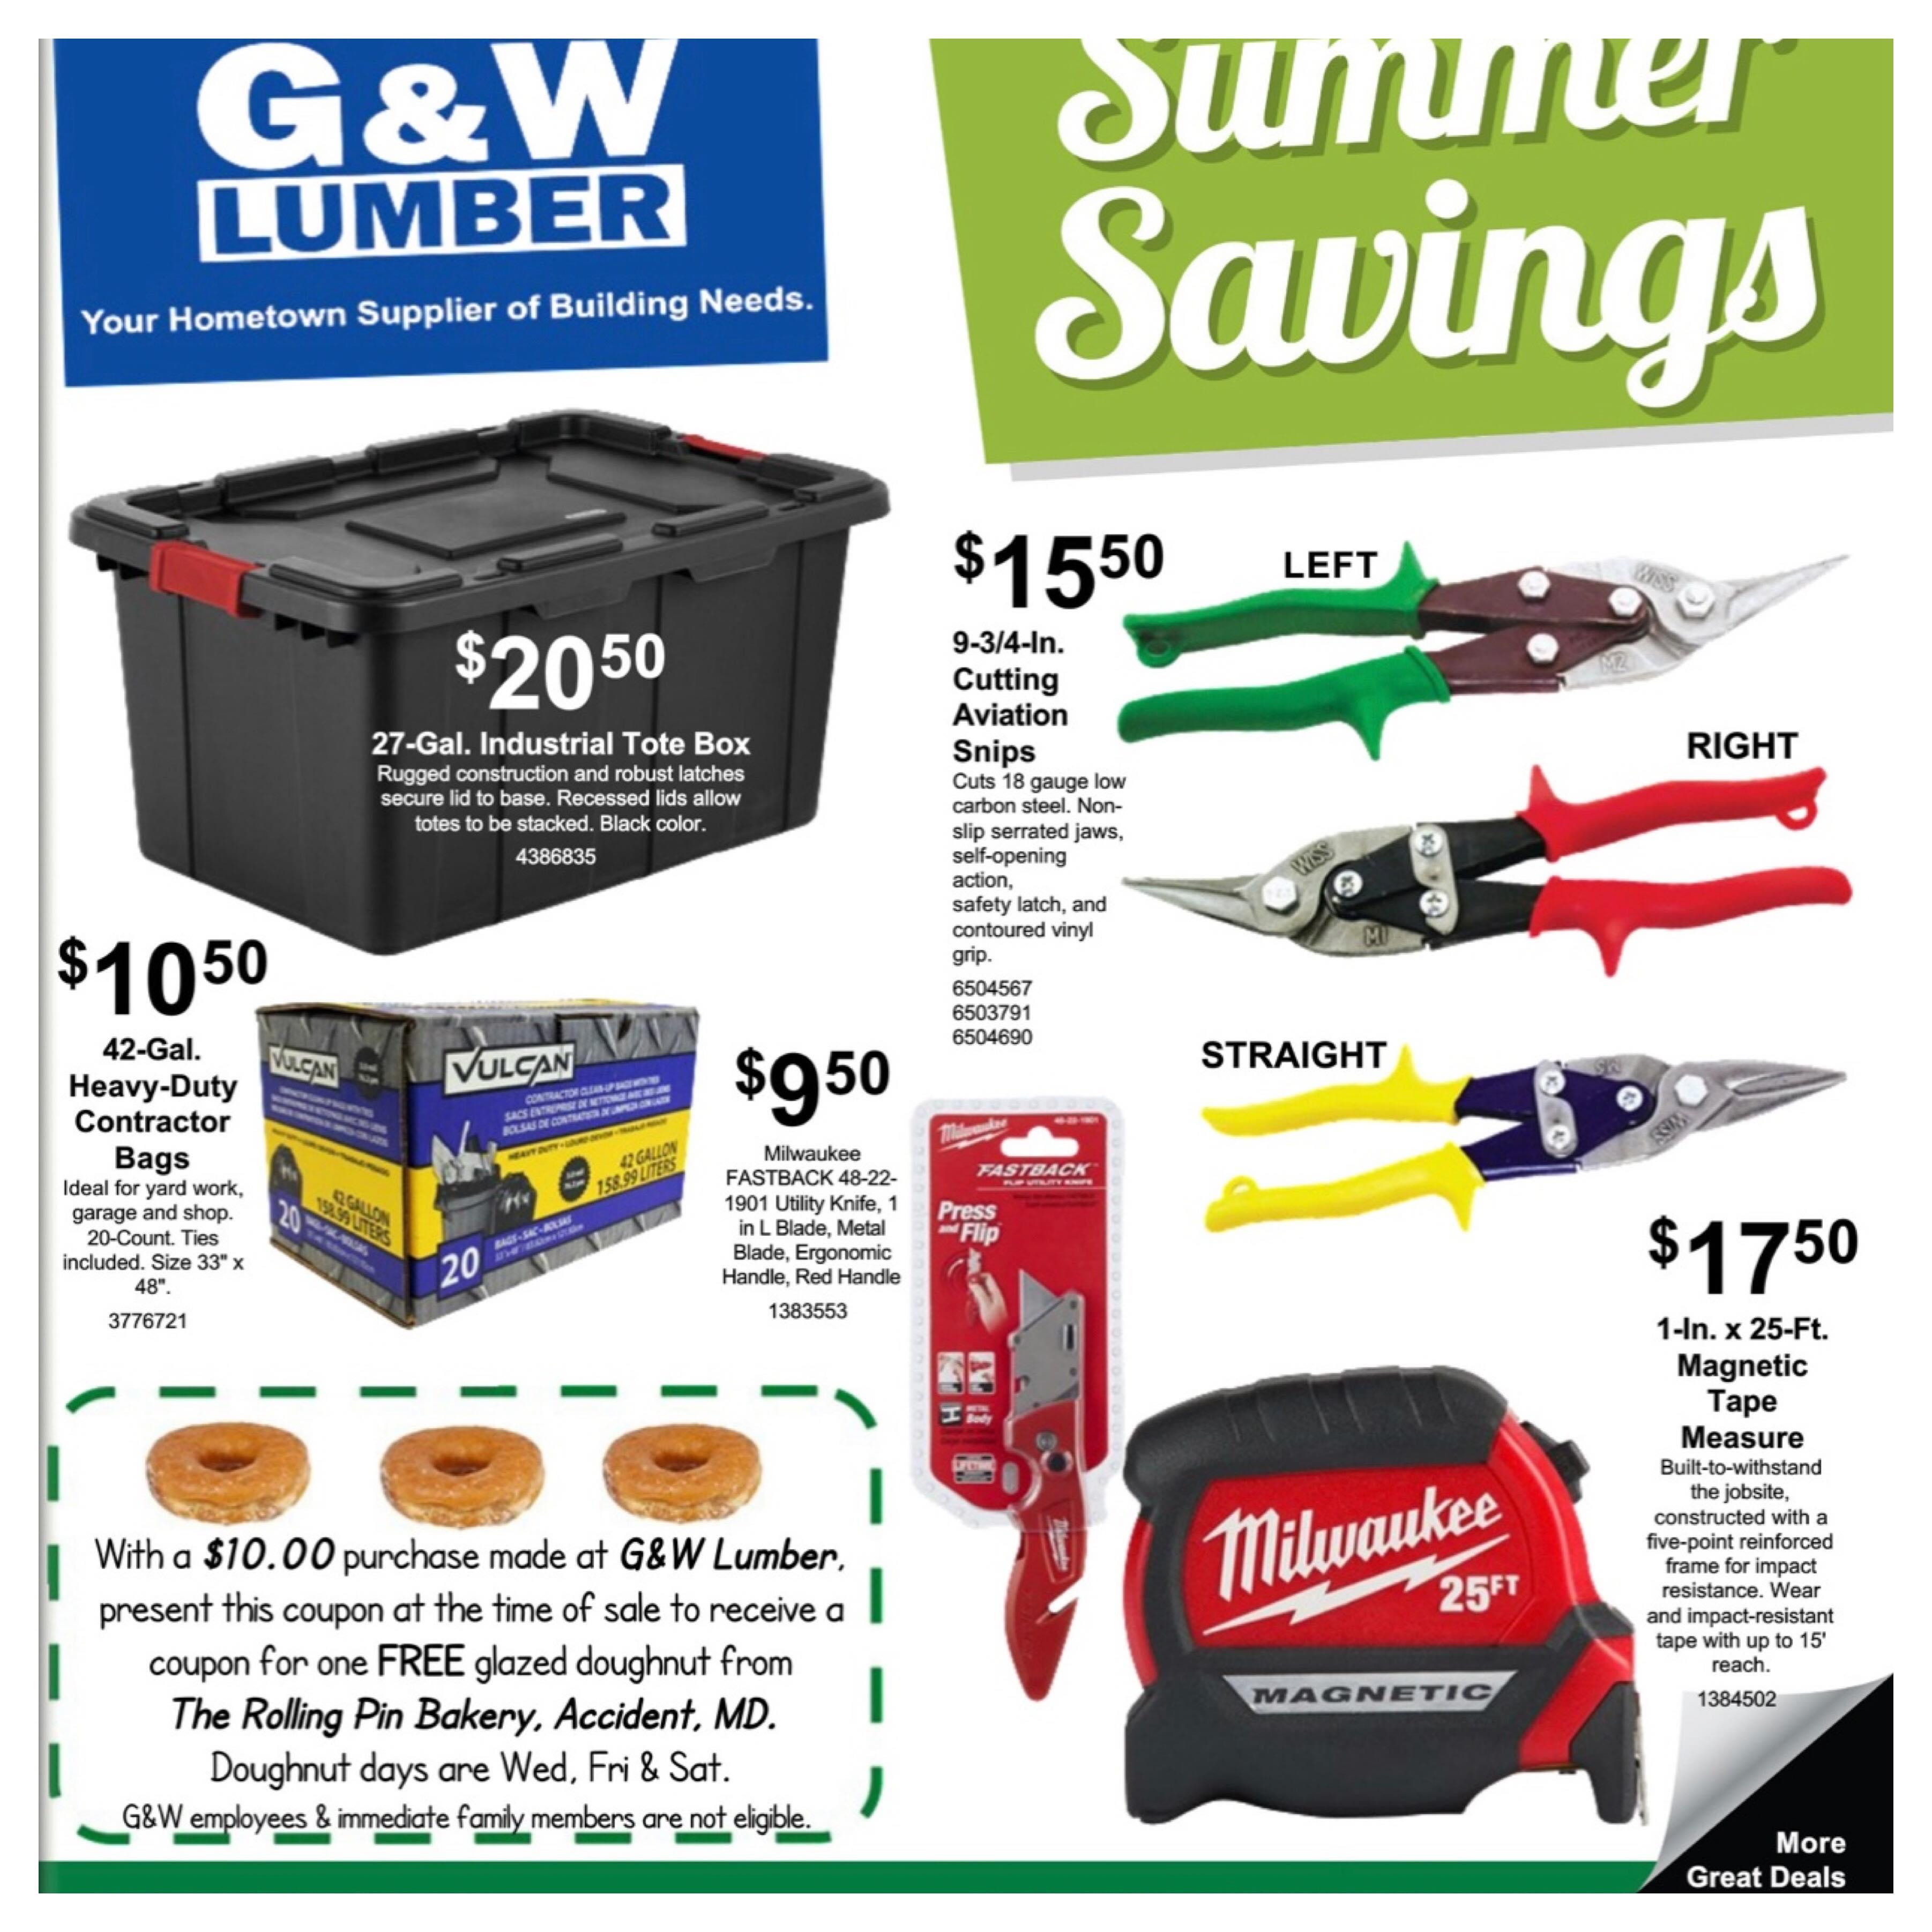 G&W Lumber Sales Flyer